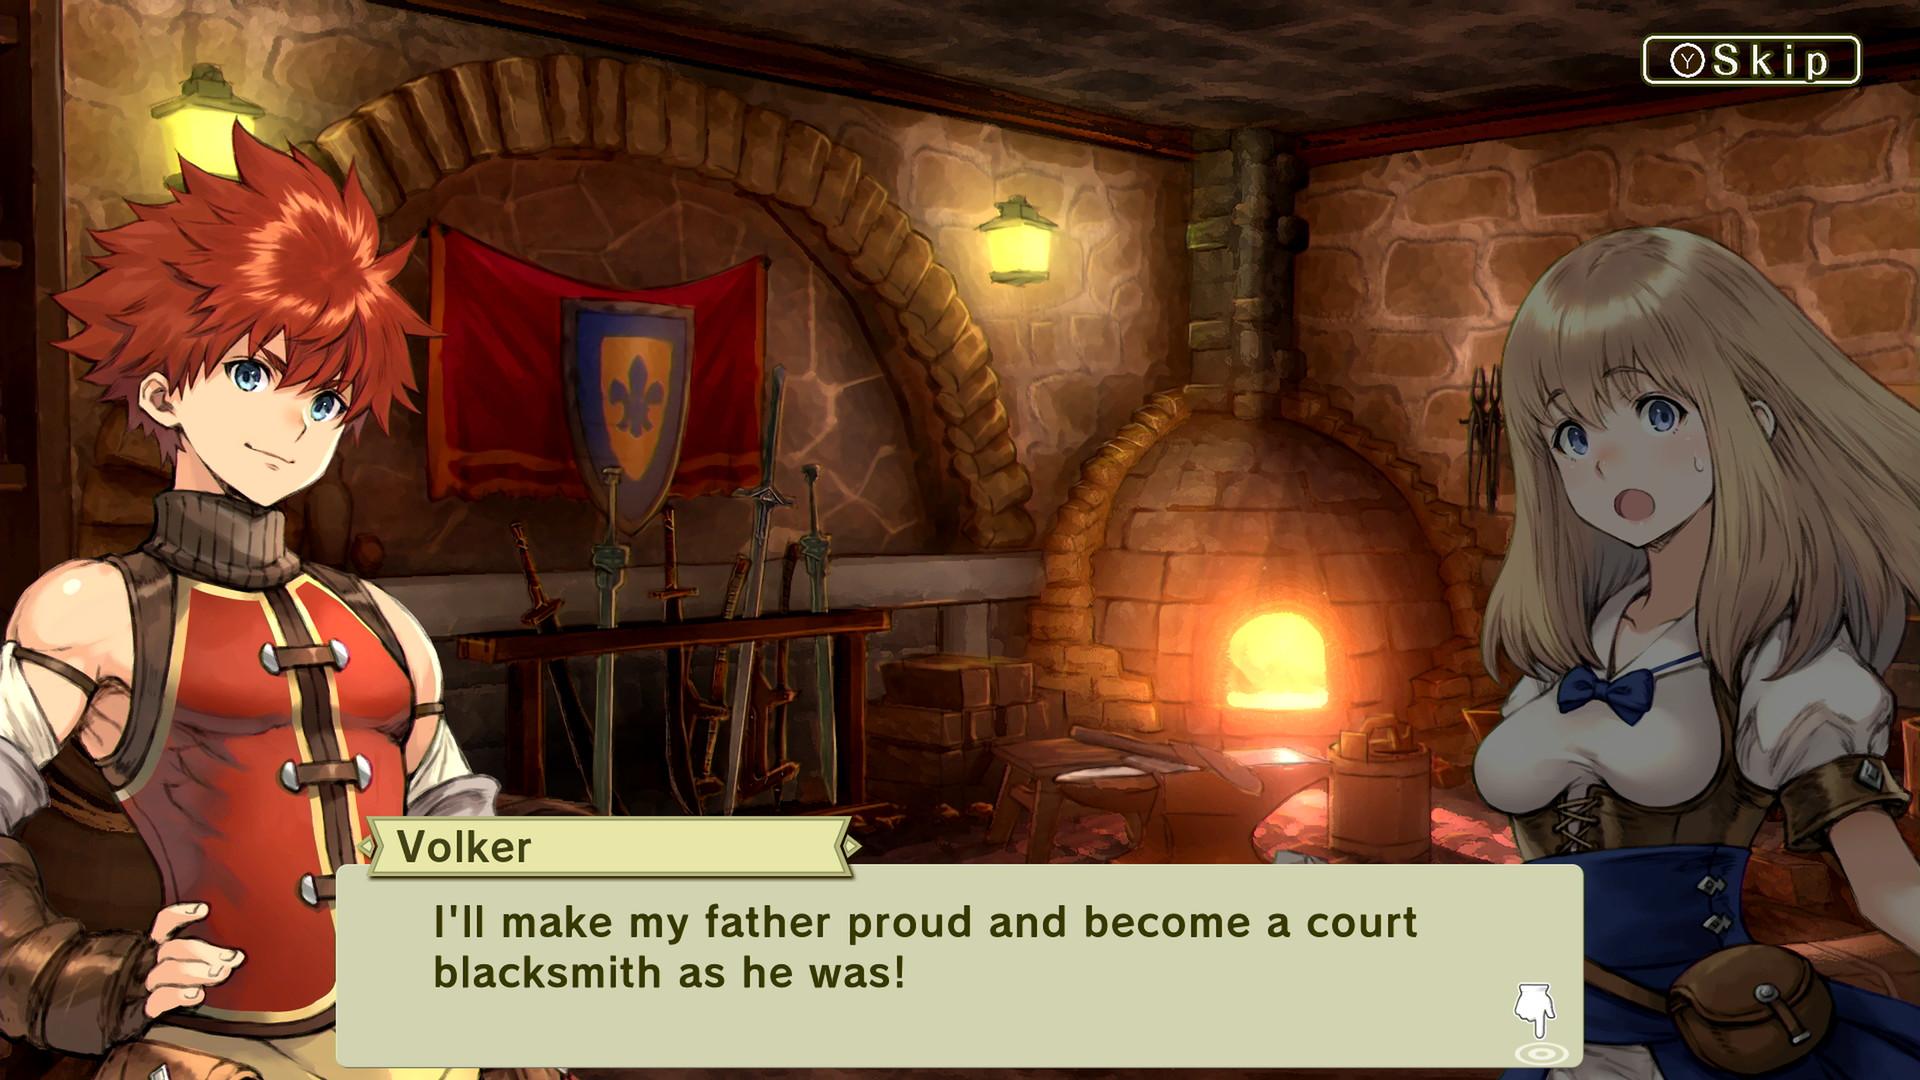 Blacksmith of the Sand Kingdom for Xbox One